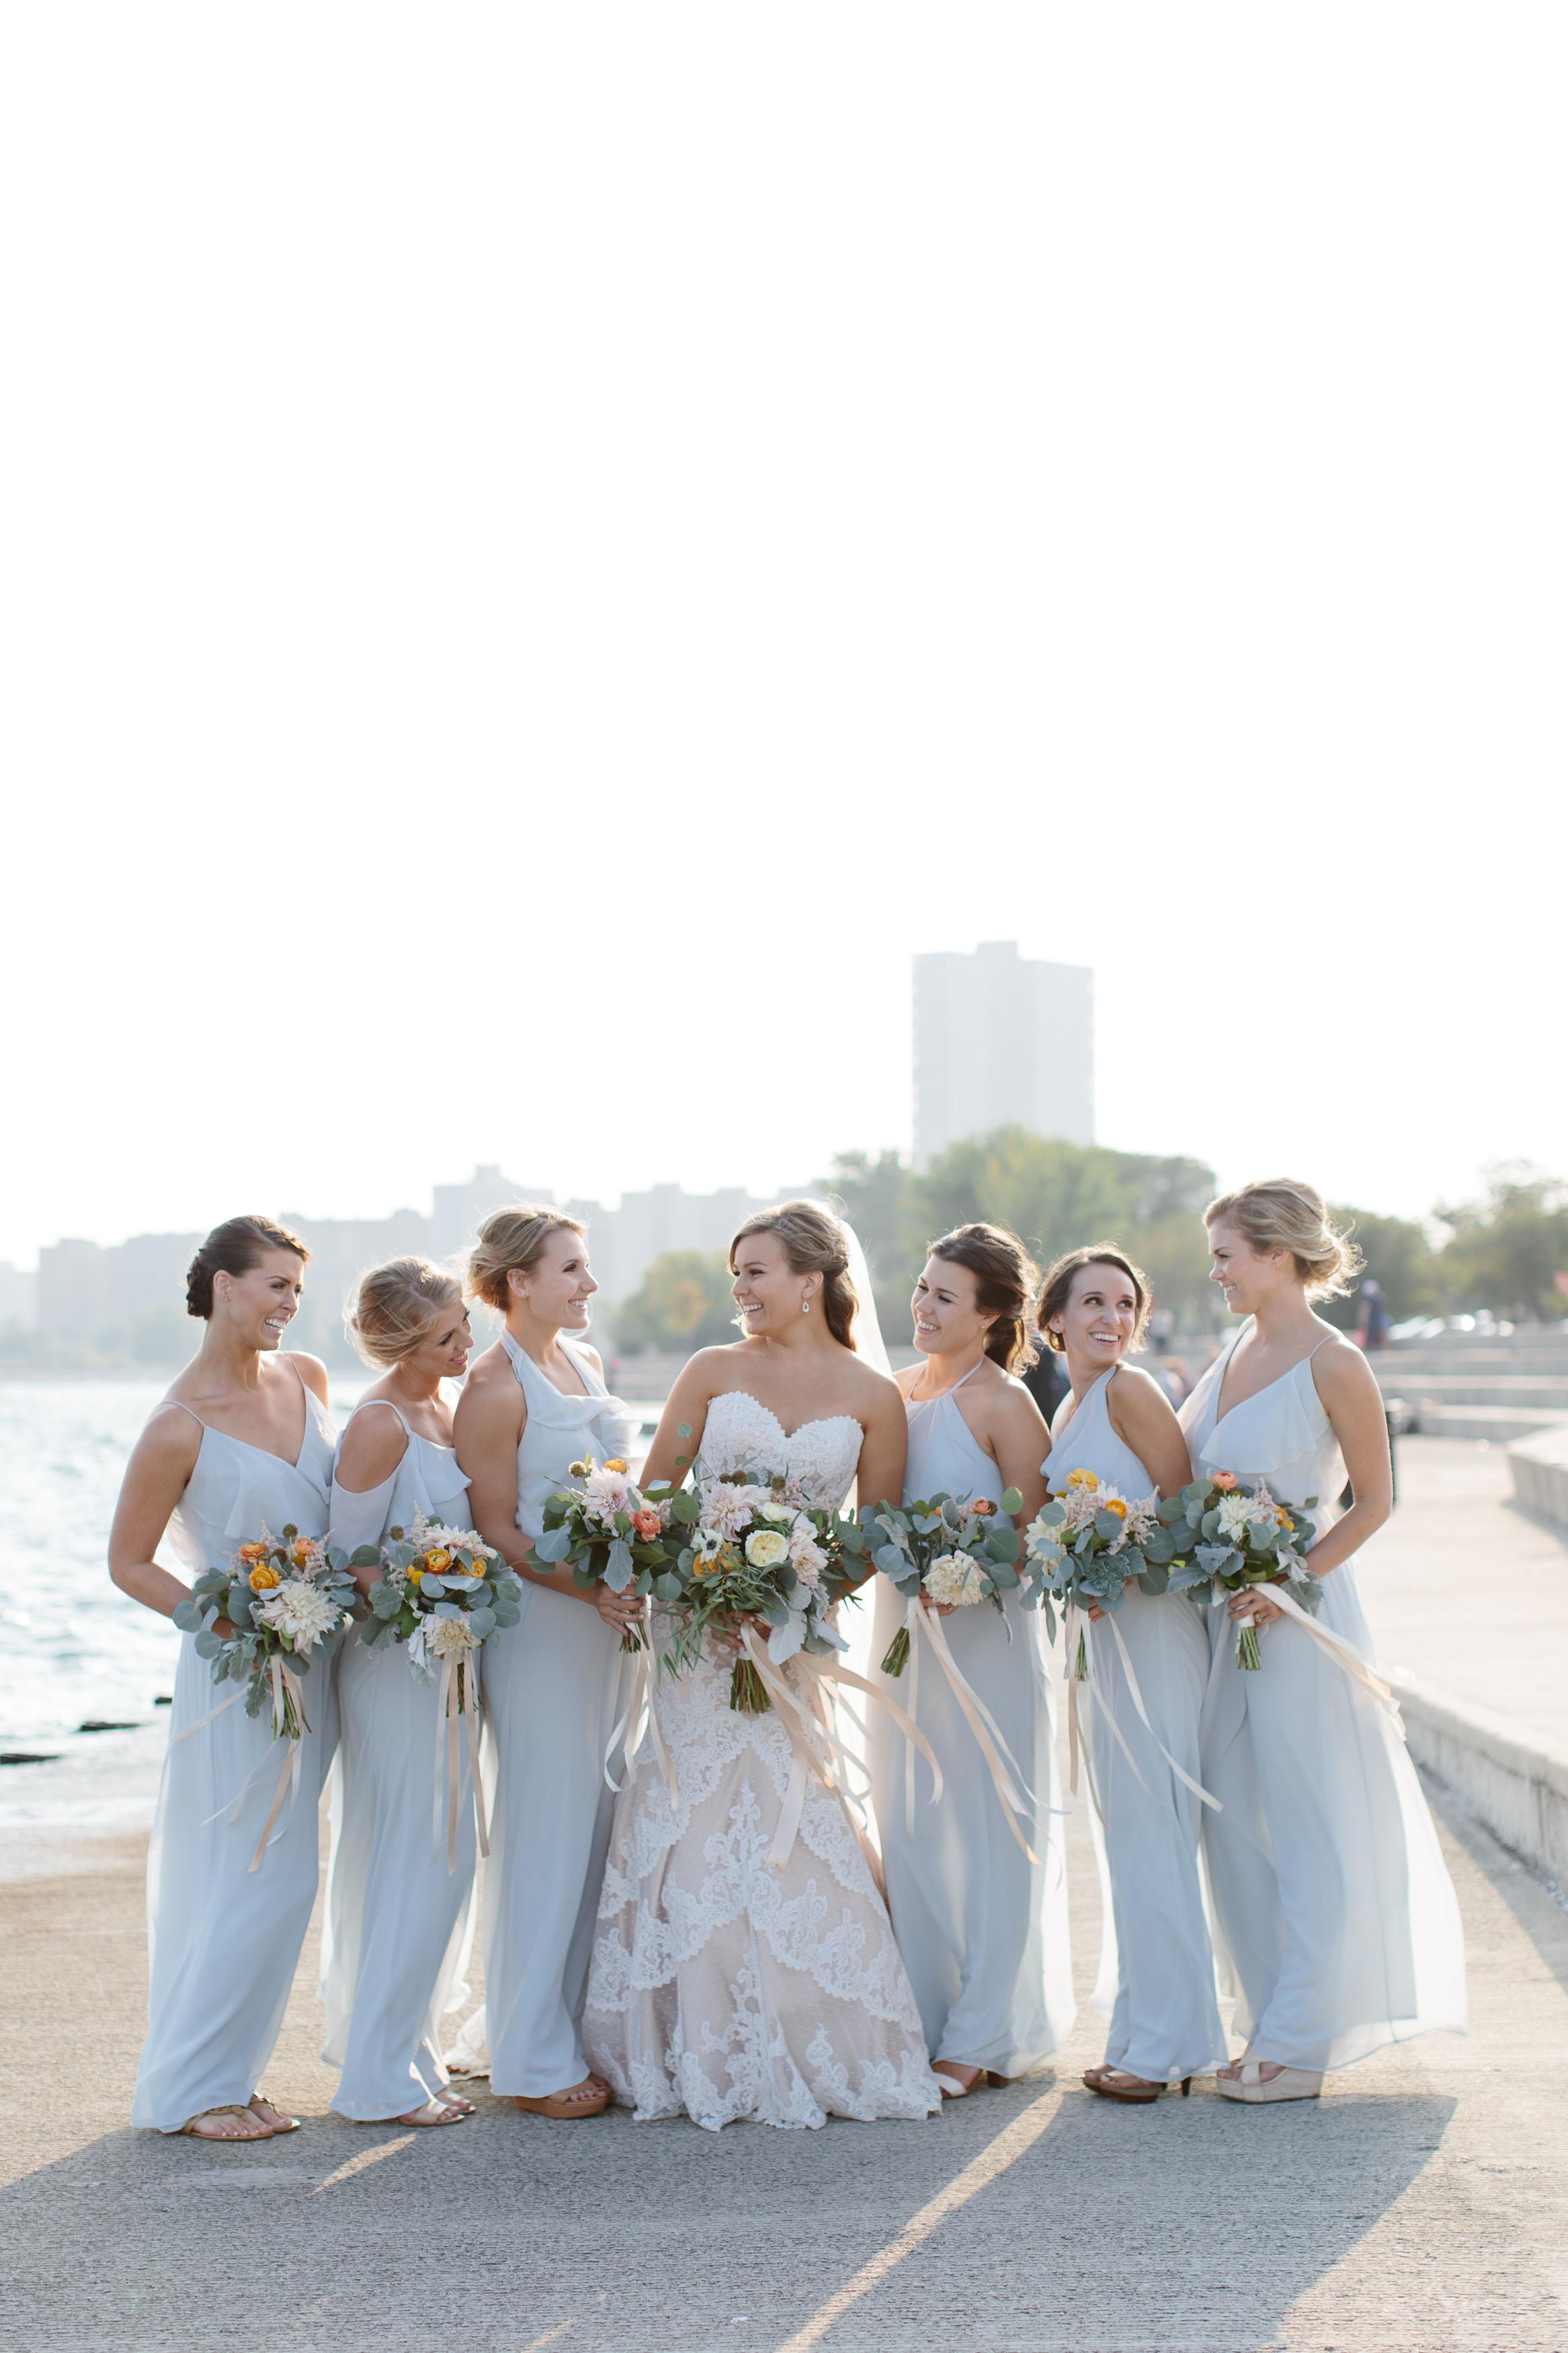 Nicodem Creative-McHugh Wedding-Artifact Events Chicago-14.jpg